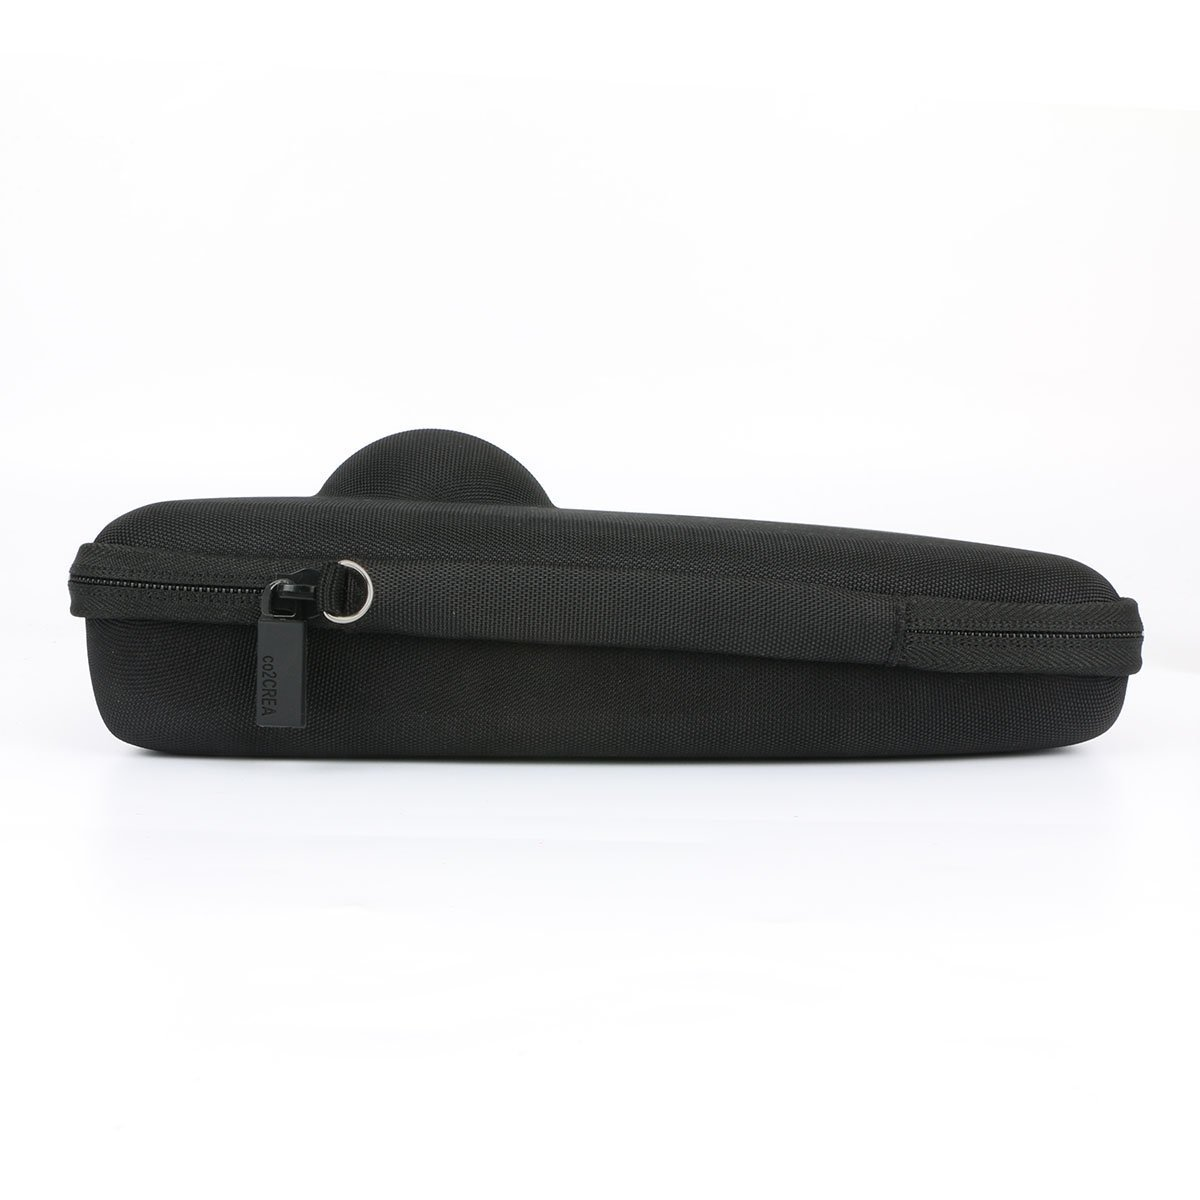 Hard Travel Case for Kensington Expert Wireless / Wired Trackball Mouse K72359WW / K64325 by co2CREA